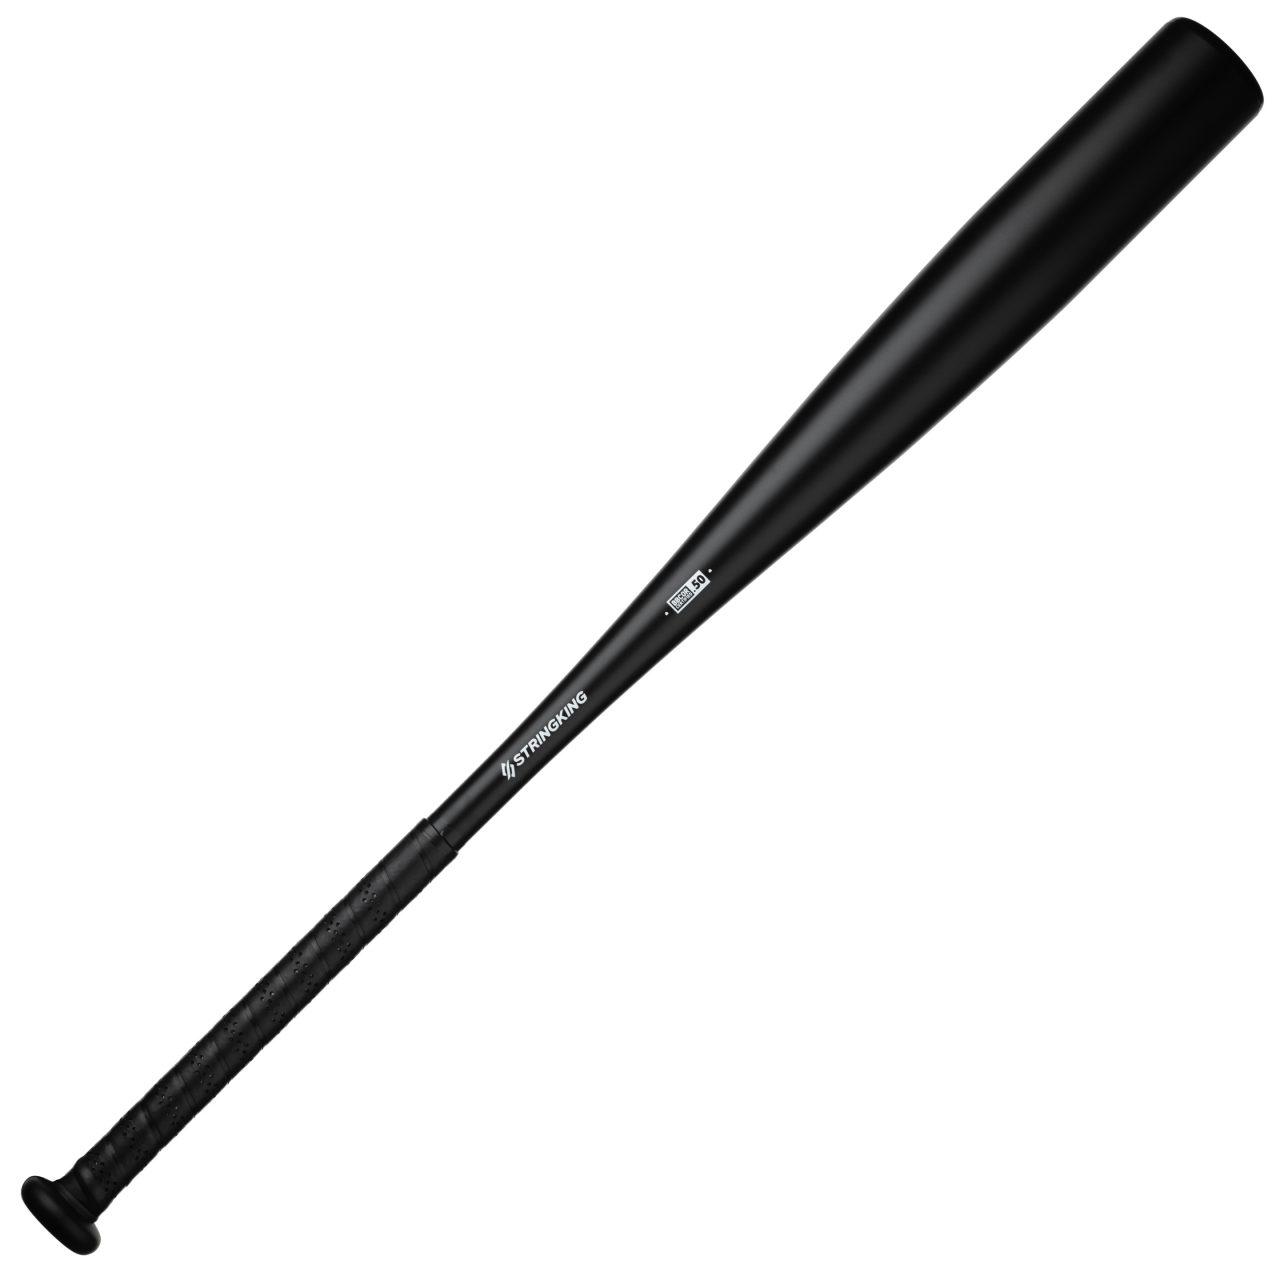 StringKing Metal Baseball Bat BBCOR 33 Inch Full View Black